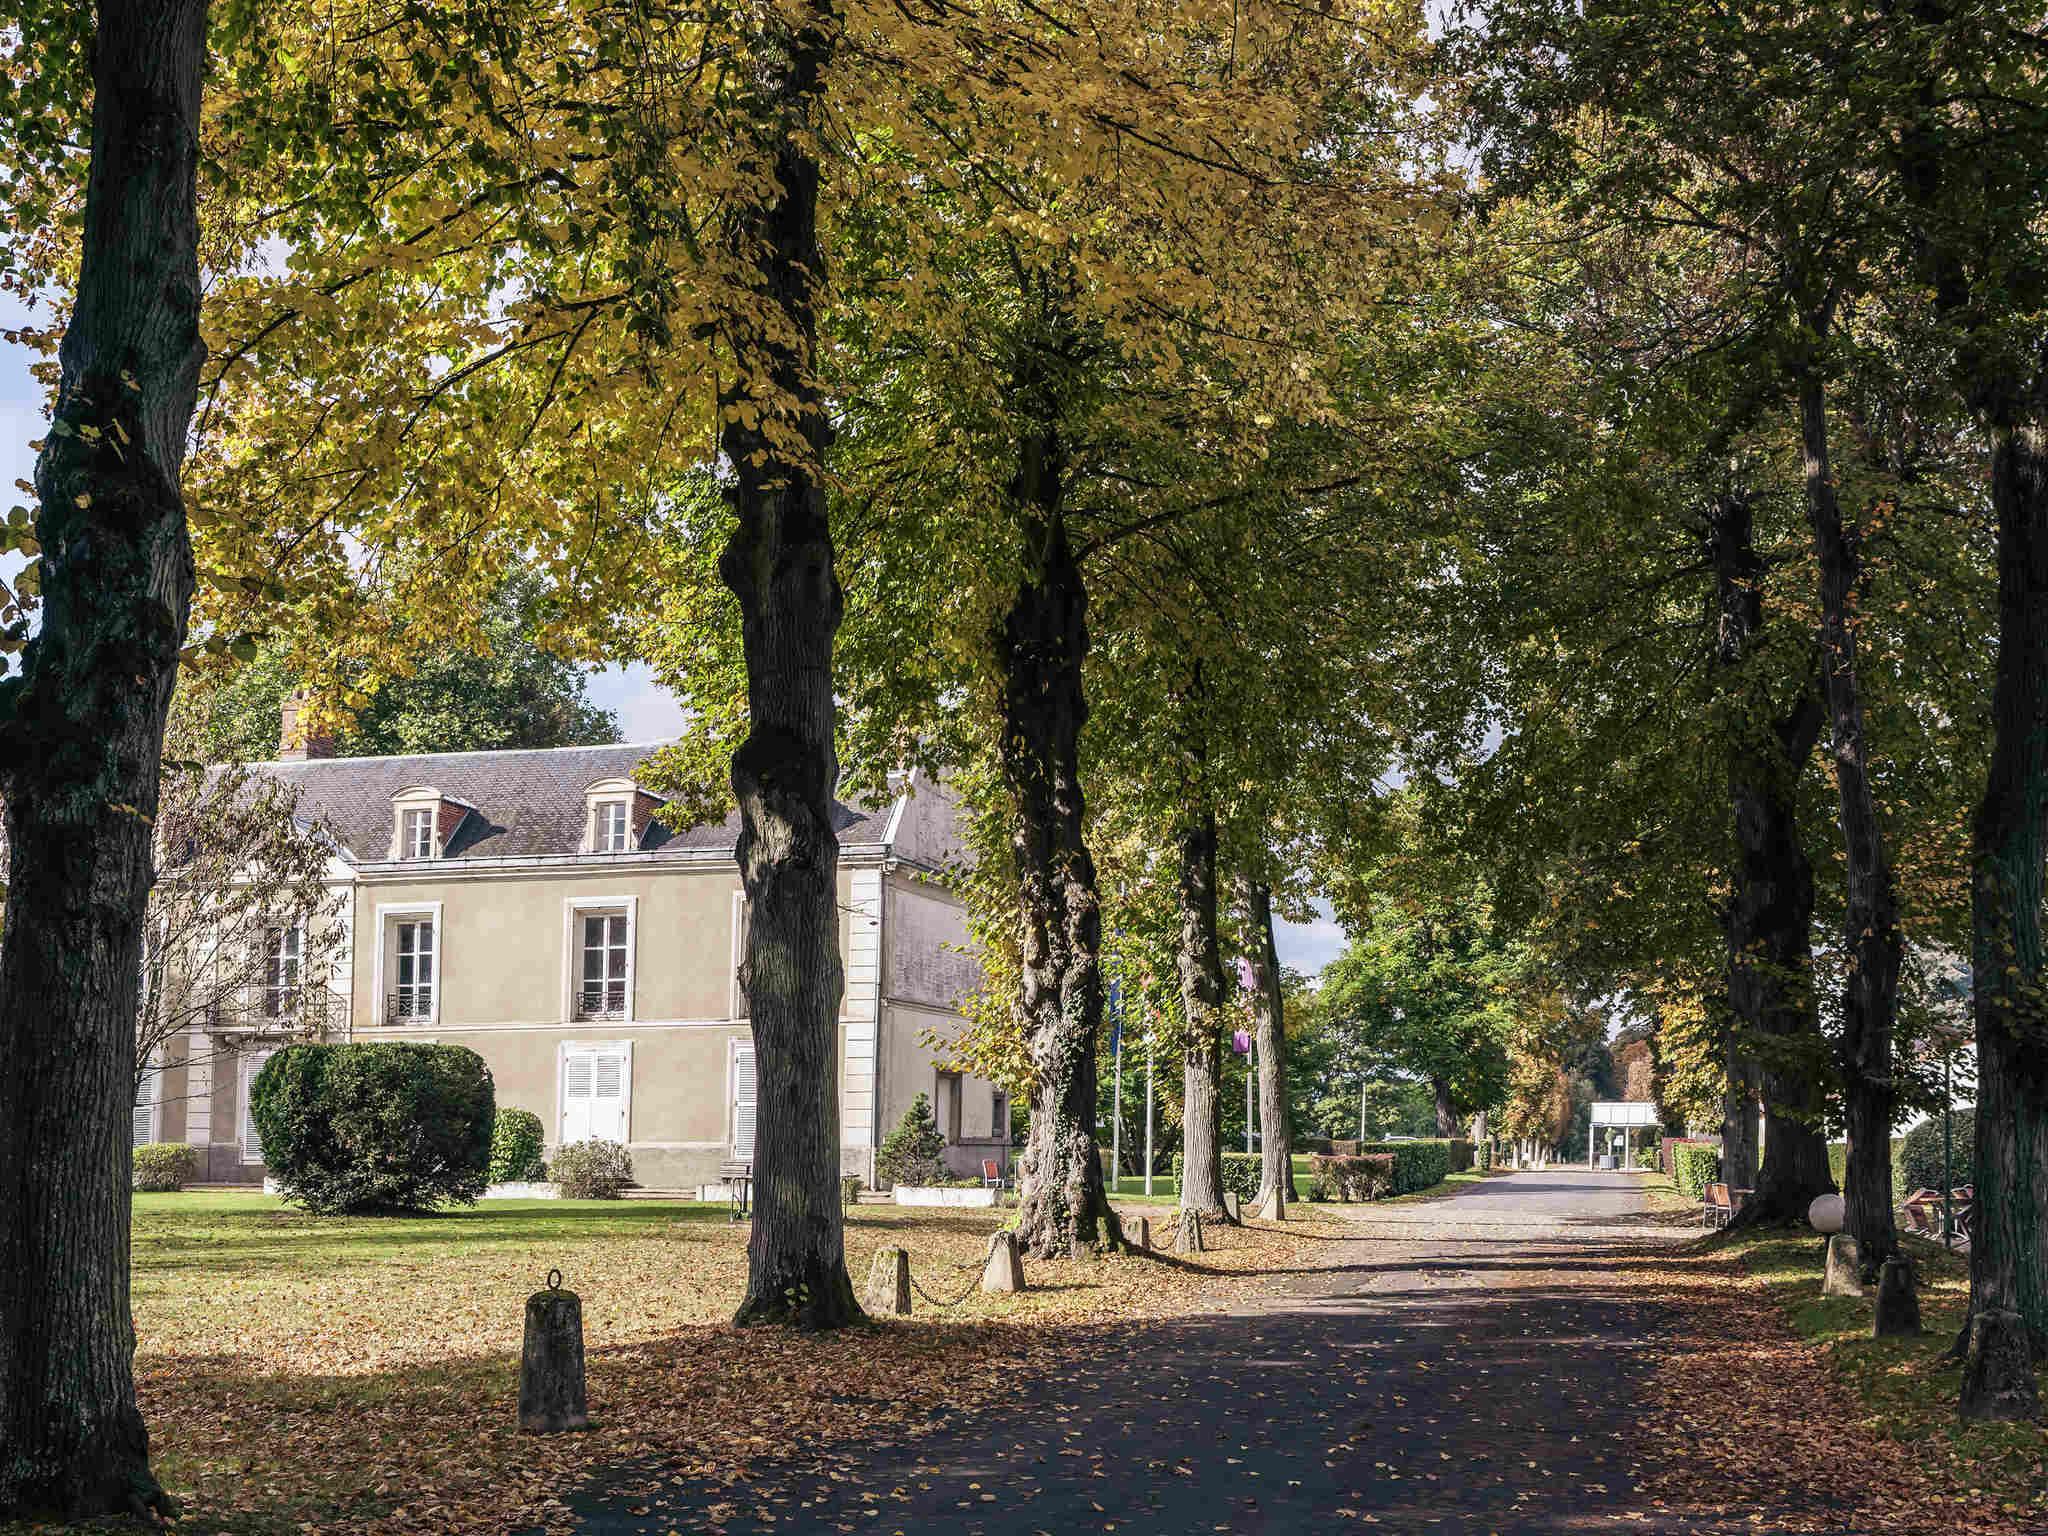 Hotel – Albergo Mercure Parigi Sud Parc du Coudray